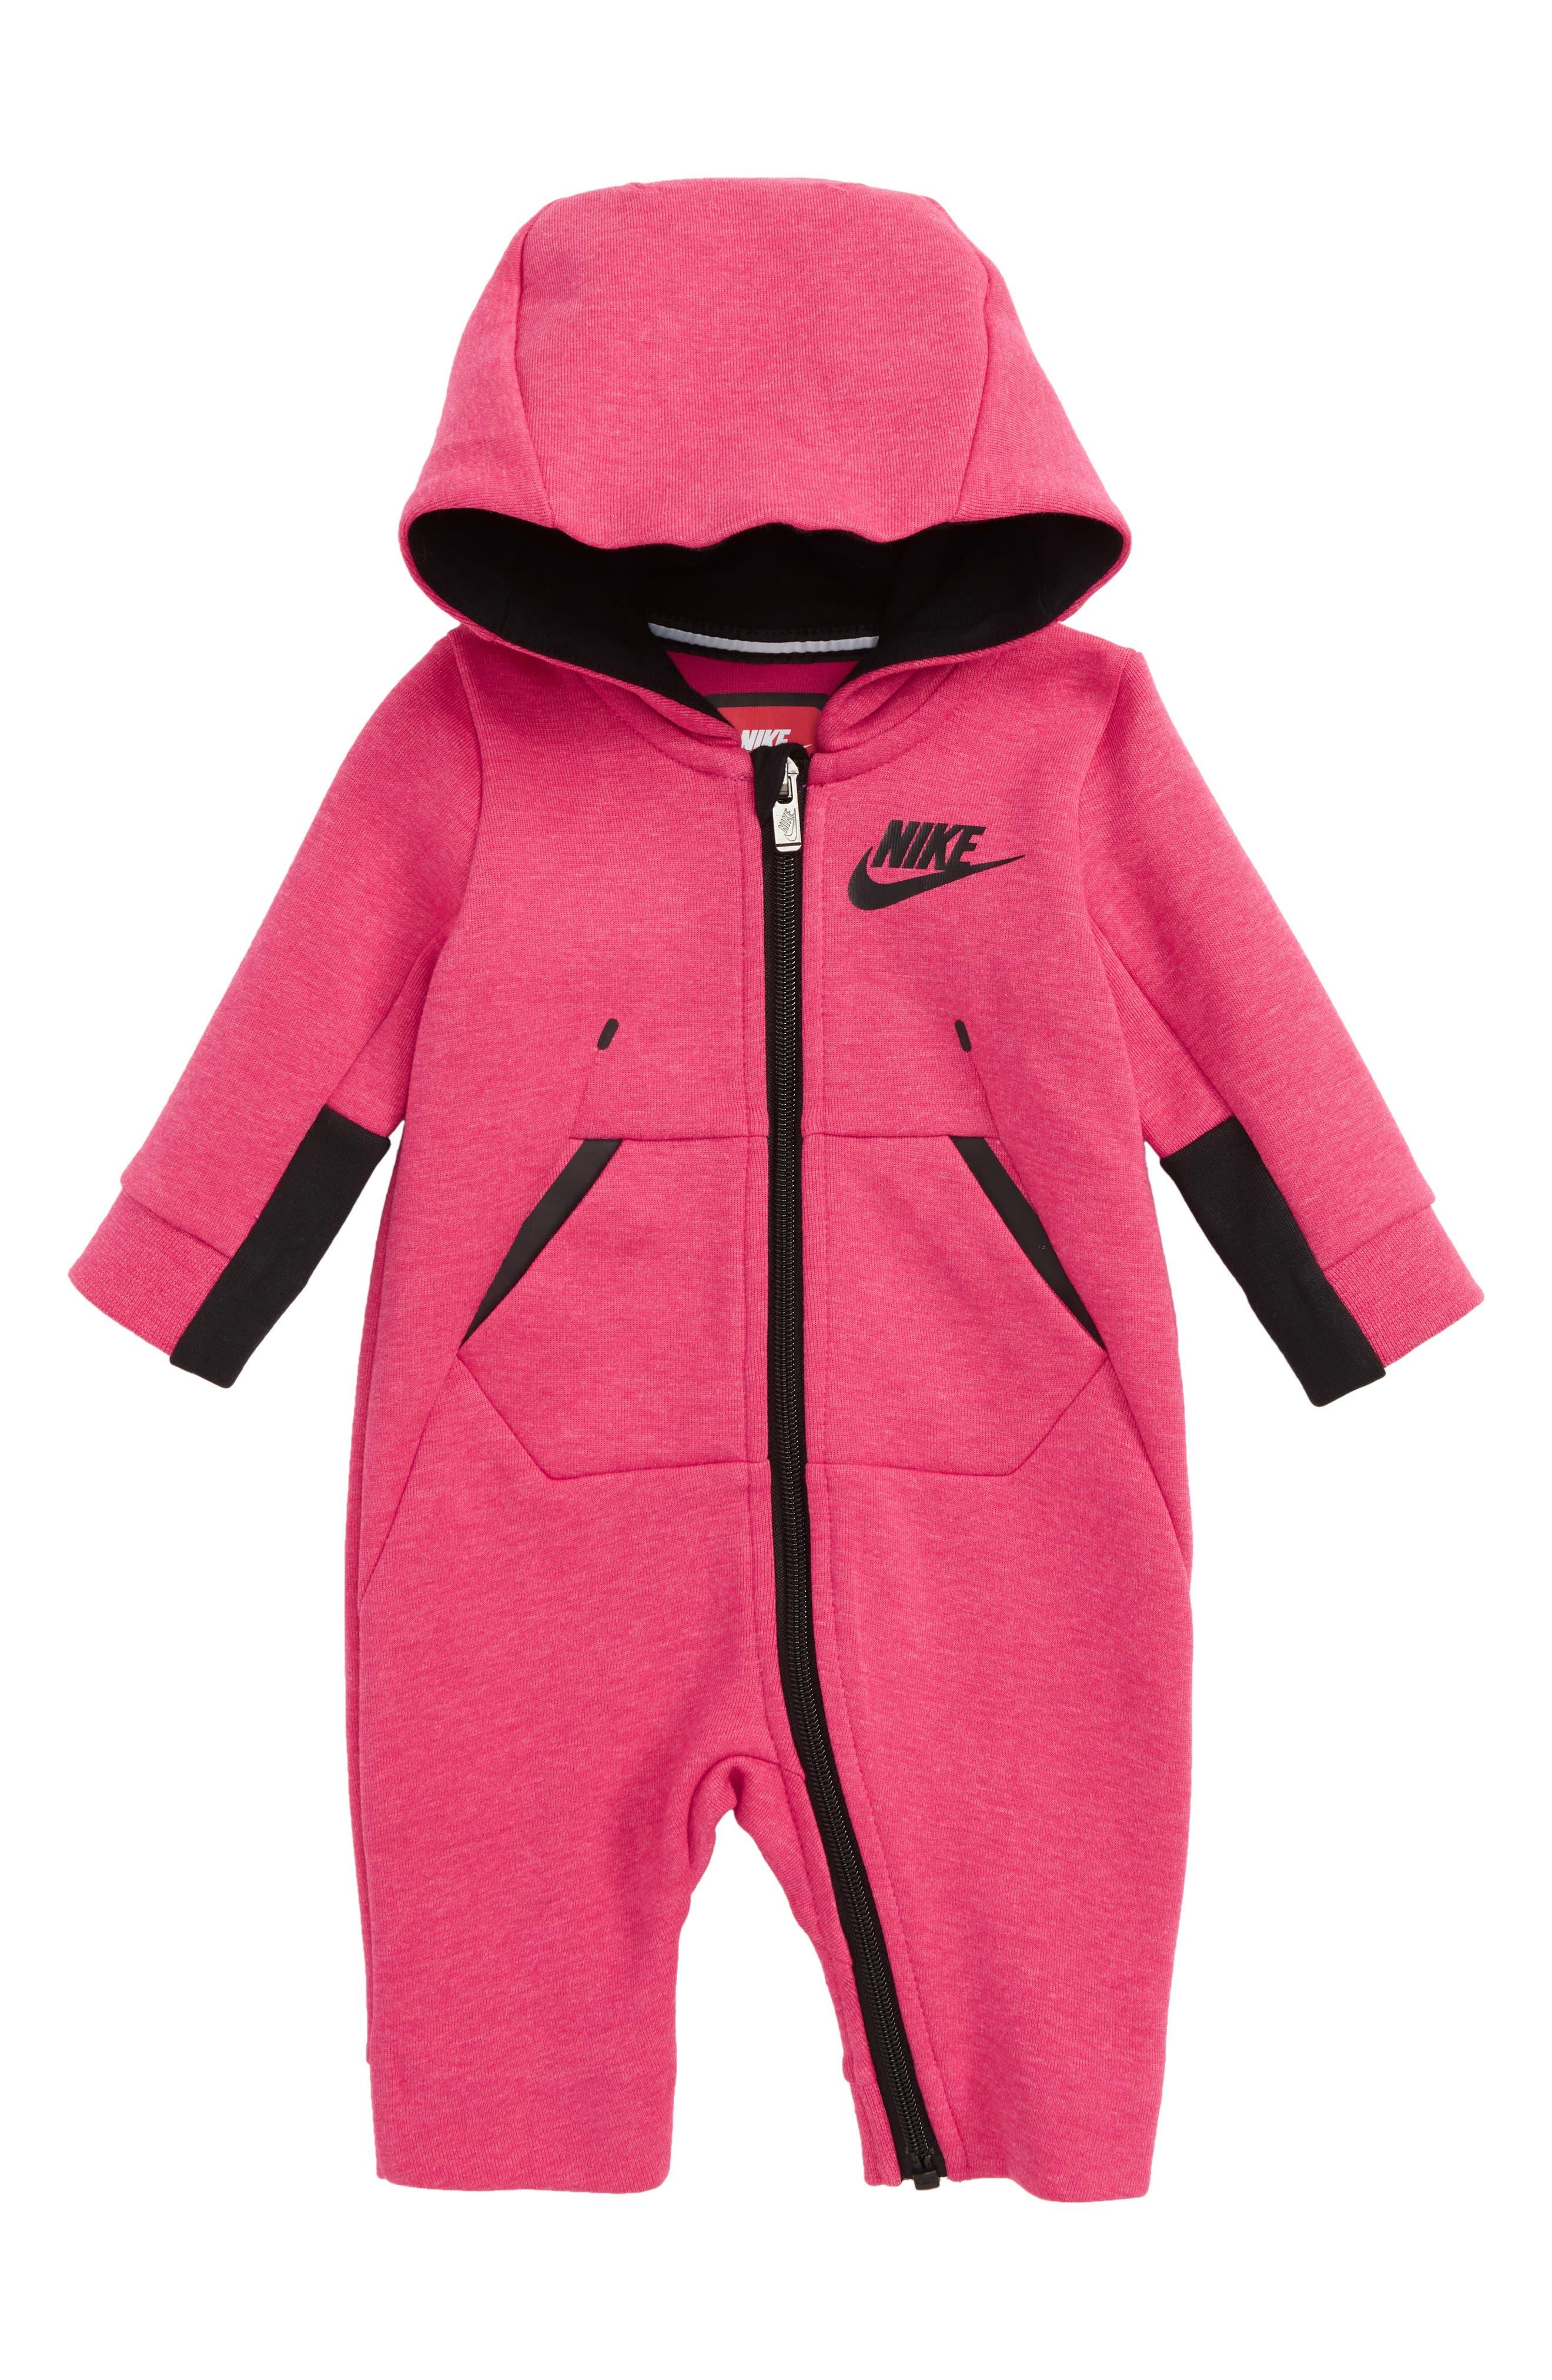 Alternate Image 1 Selected - Nike Tech Fleece Hooded Romper (Baby Girls)